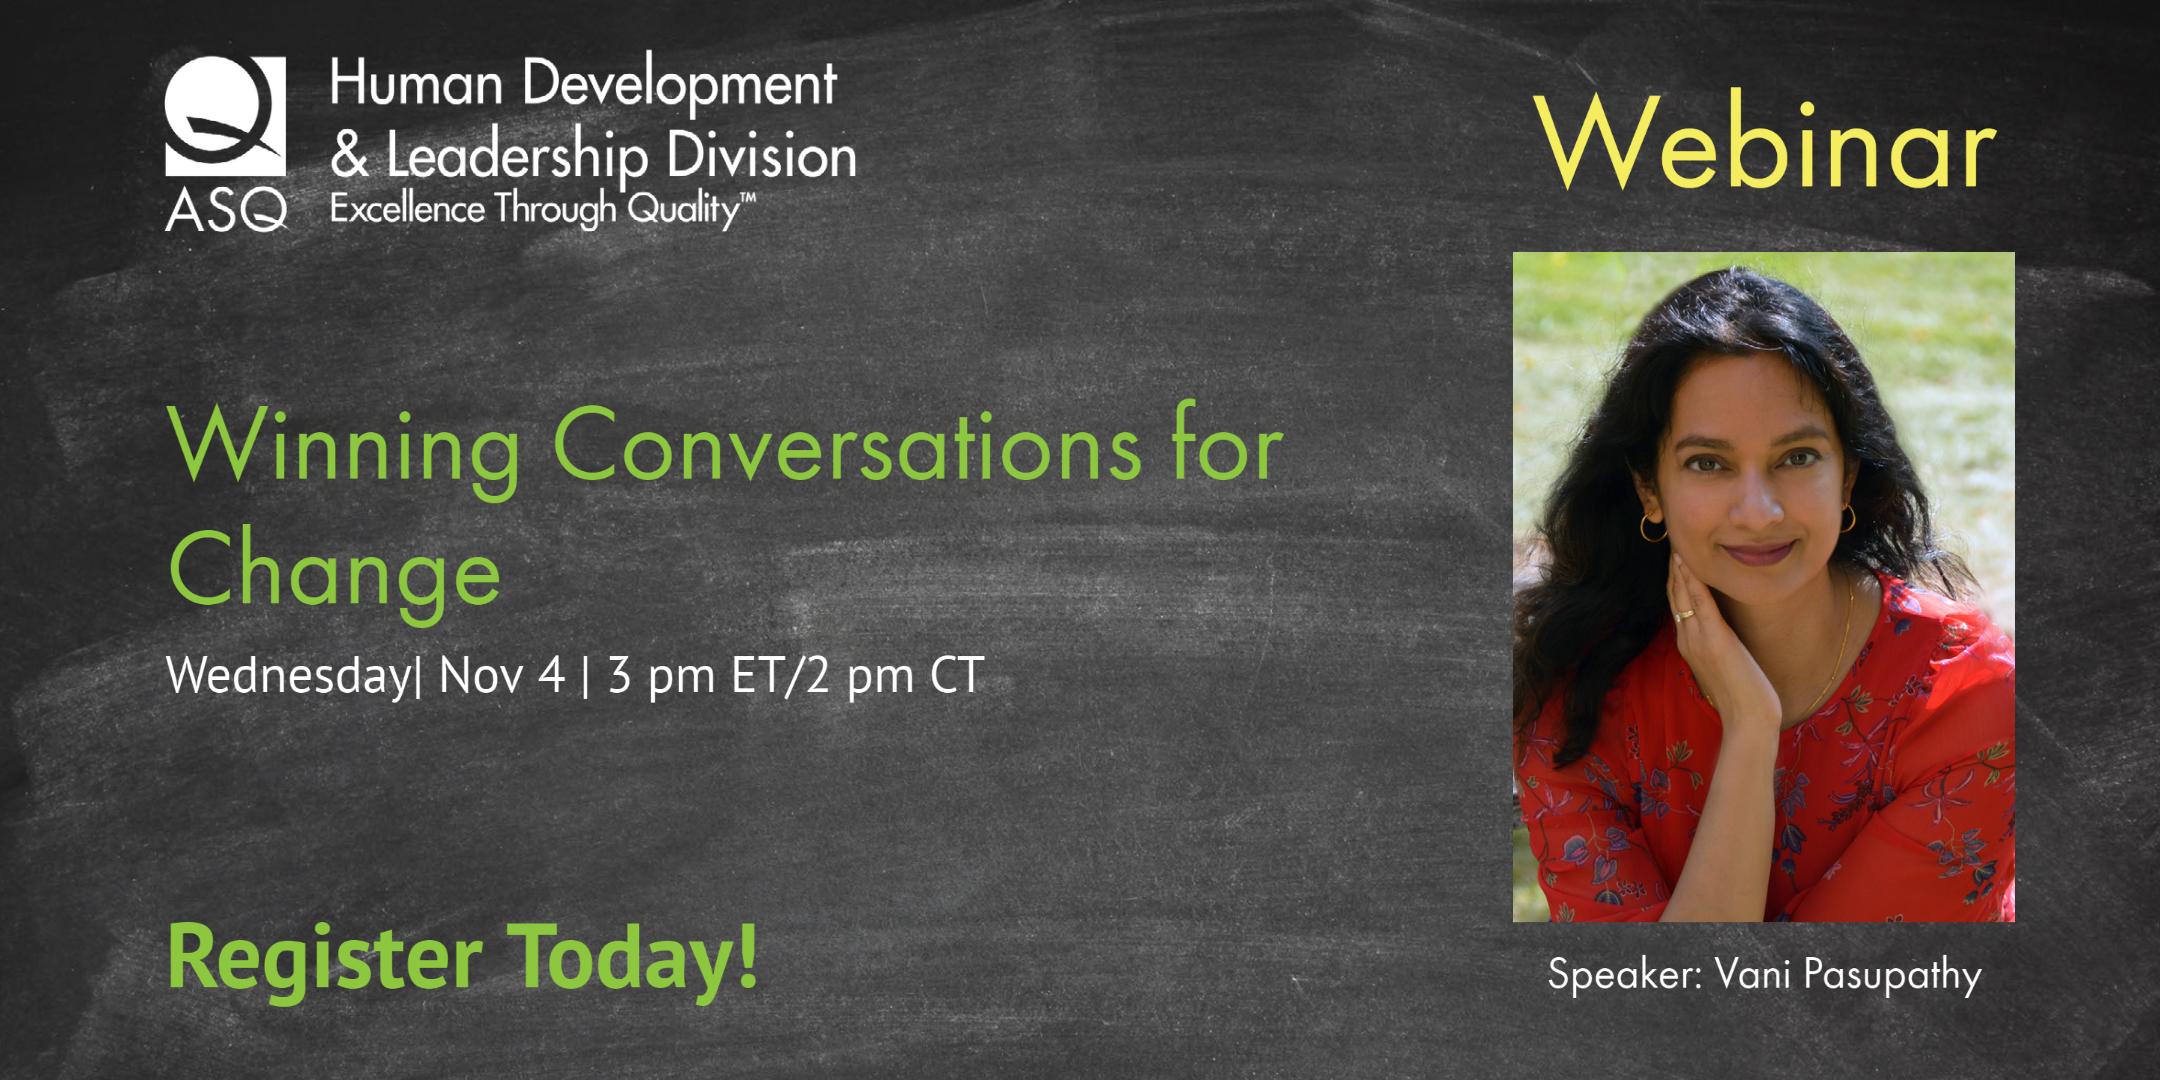 HD&L Webinar: Winning Conversations for Change 2263